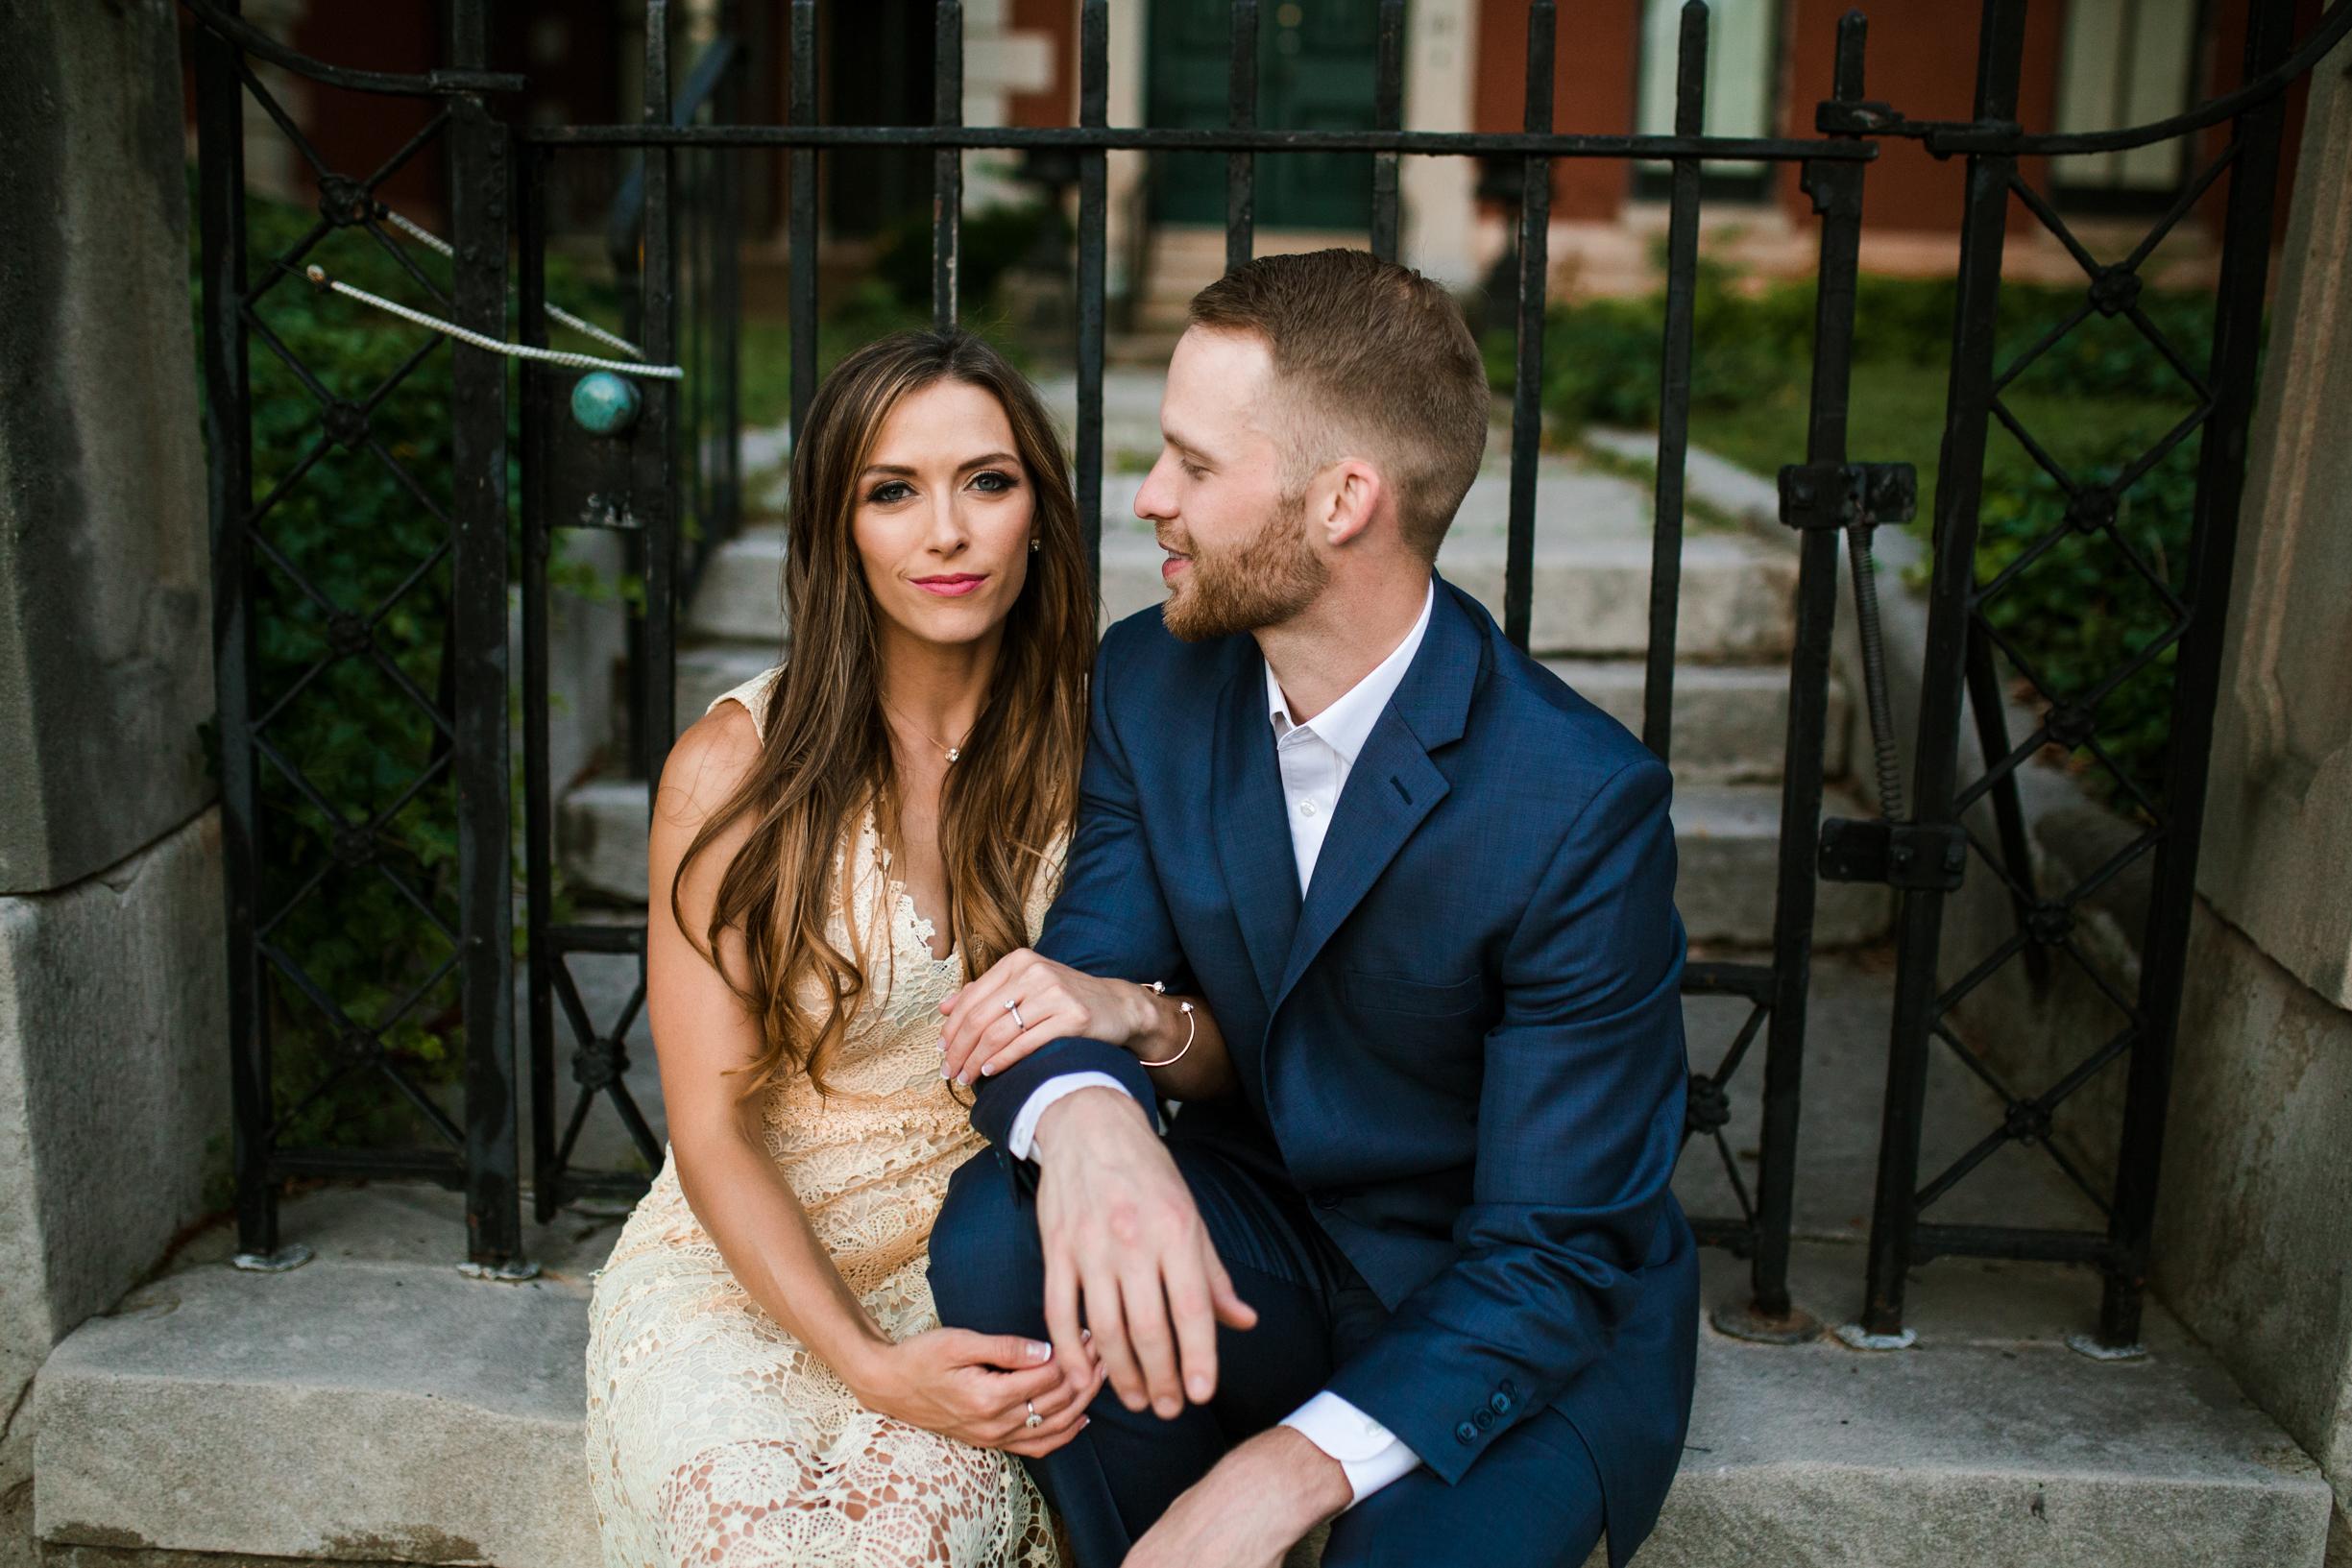 Victoria & Chad Engagement 2018 Crystal Ludwick Photo Louisville Kentucky Wedding Photographer WEBSITE (6 of 48).jpg